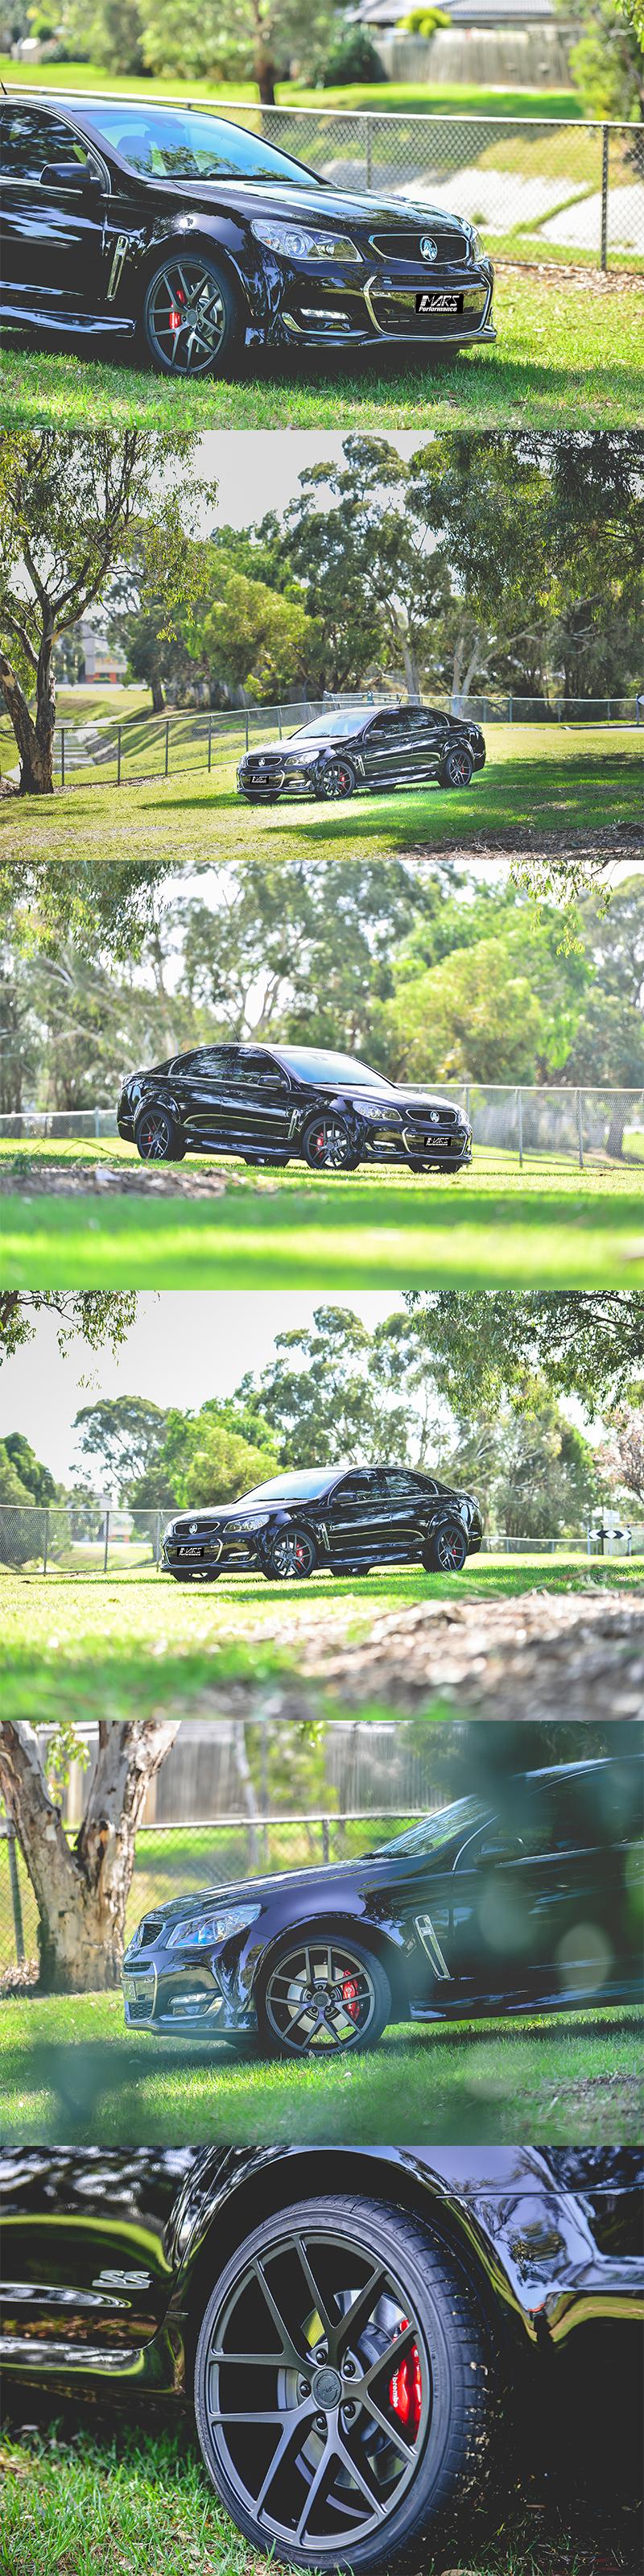 Mars Mp Kw 20 Inch 5x120 Matt Sandy Black Stag Alloy Wheels Rims For Holden Commodore Amp Hsv